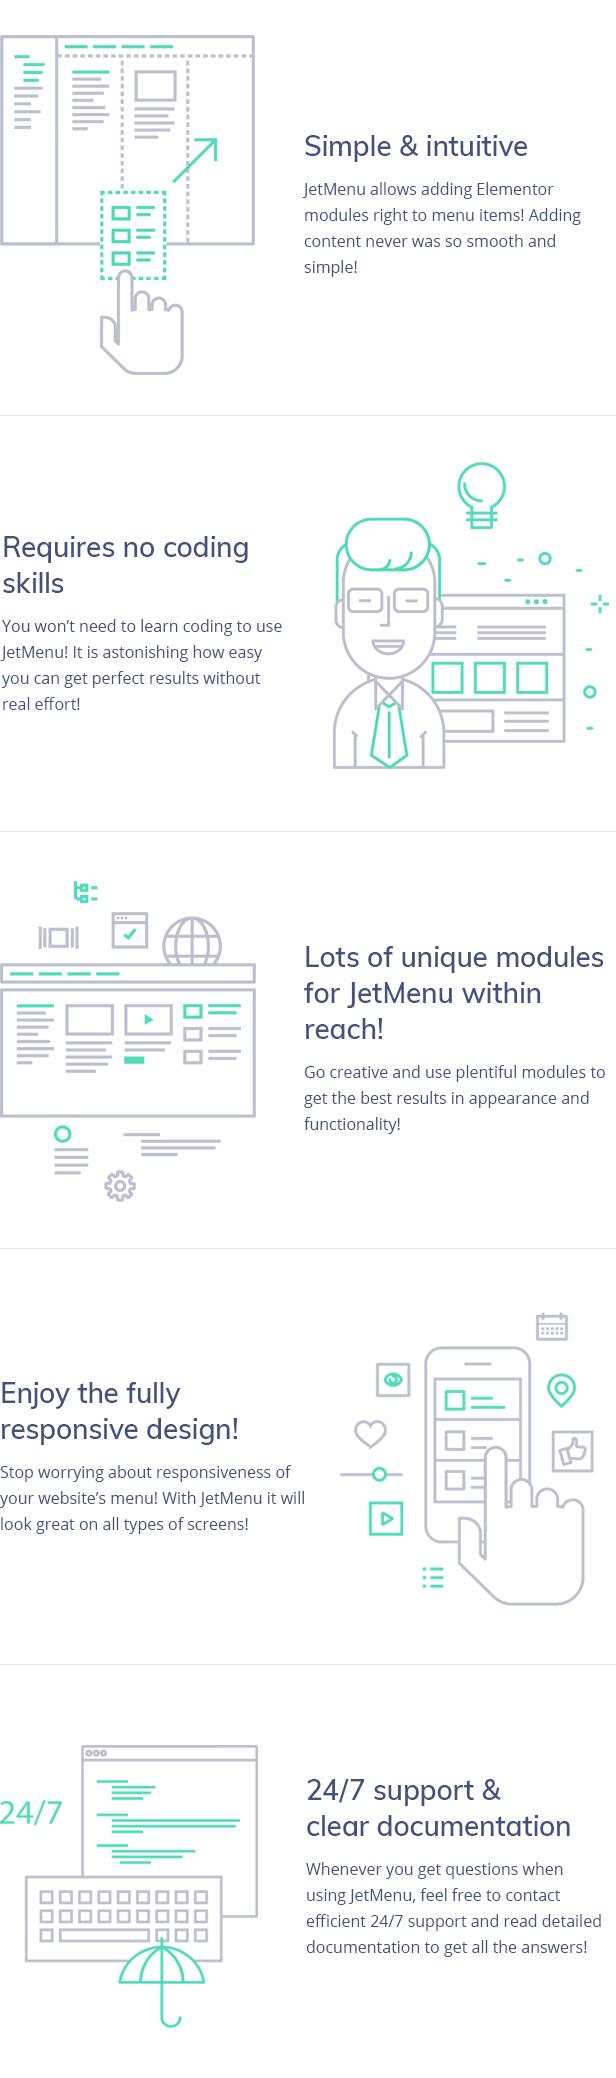 JetMenu - Mega Menu for Elementor Page Builder WordPress Plugin - Features Image 7